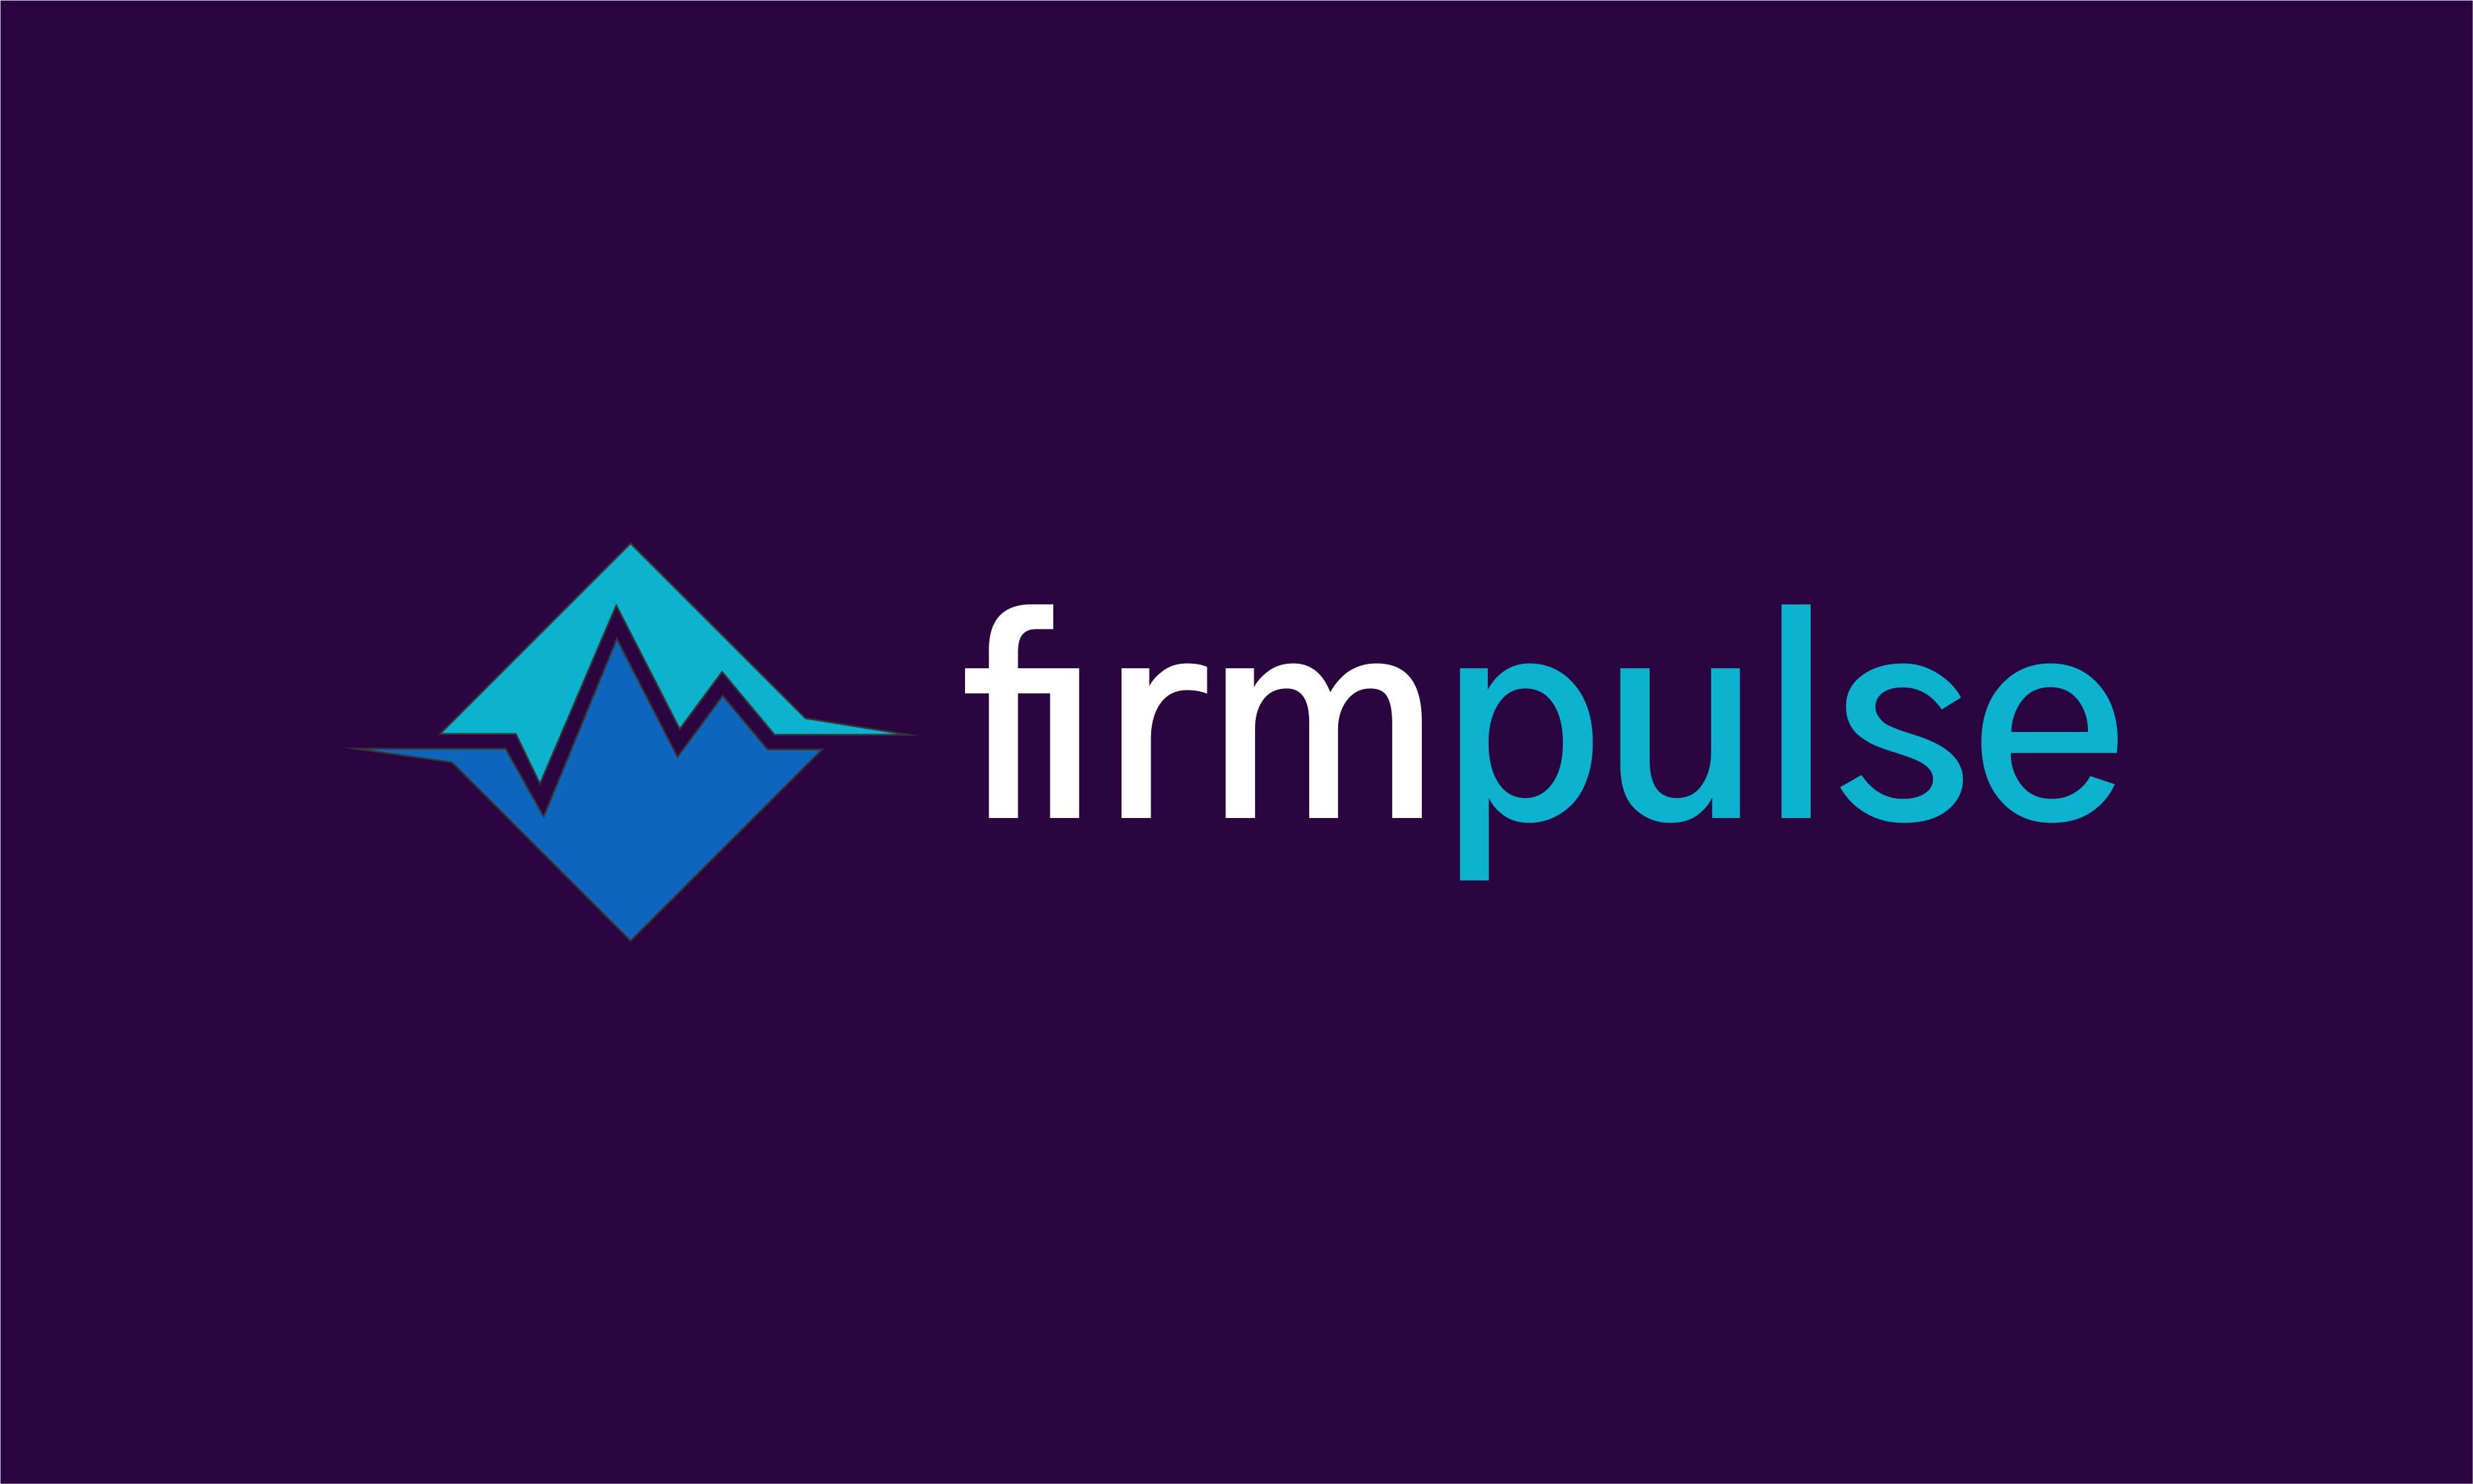 Firmpulse